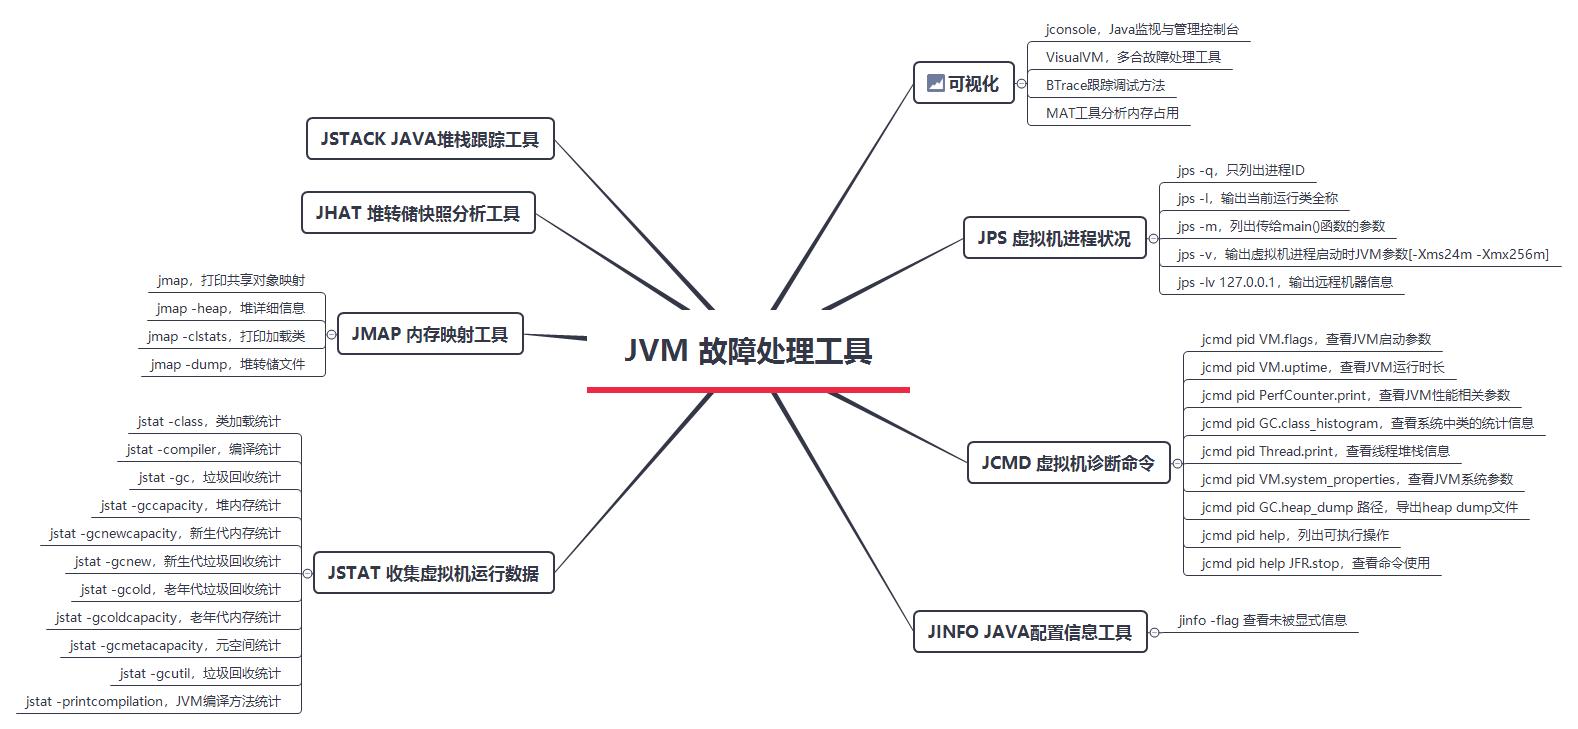 JVM 故障处理工具